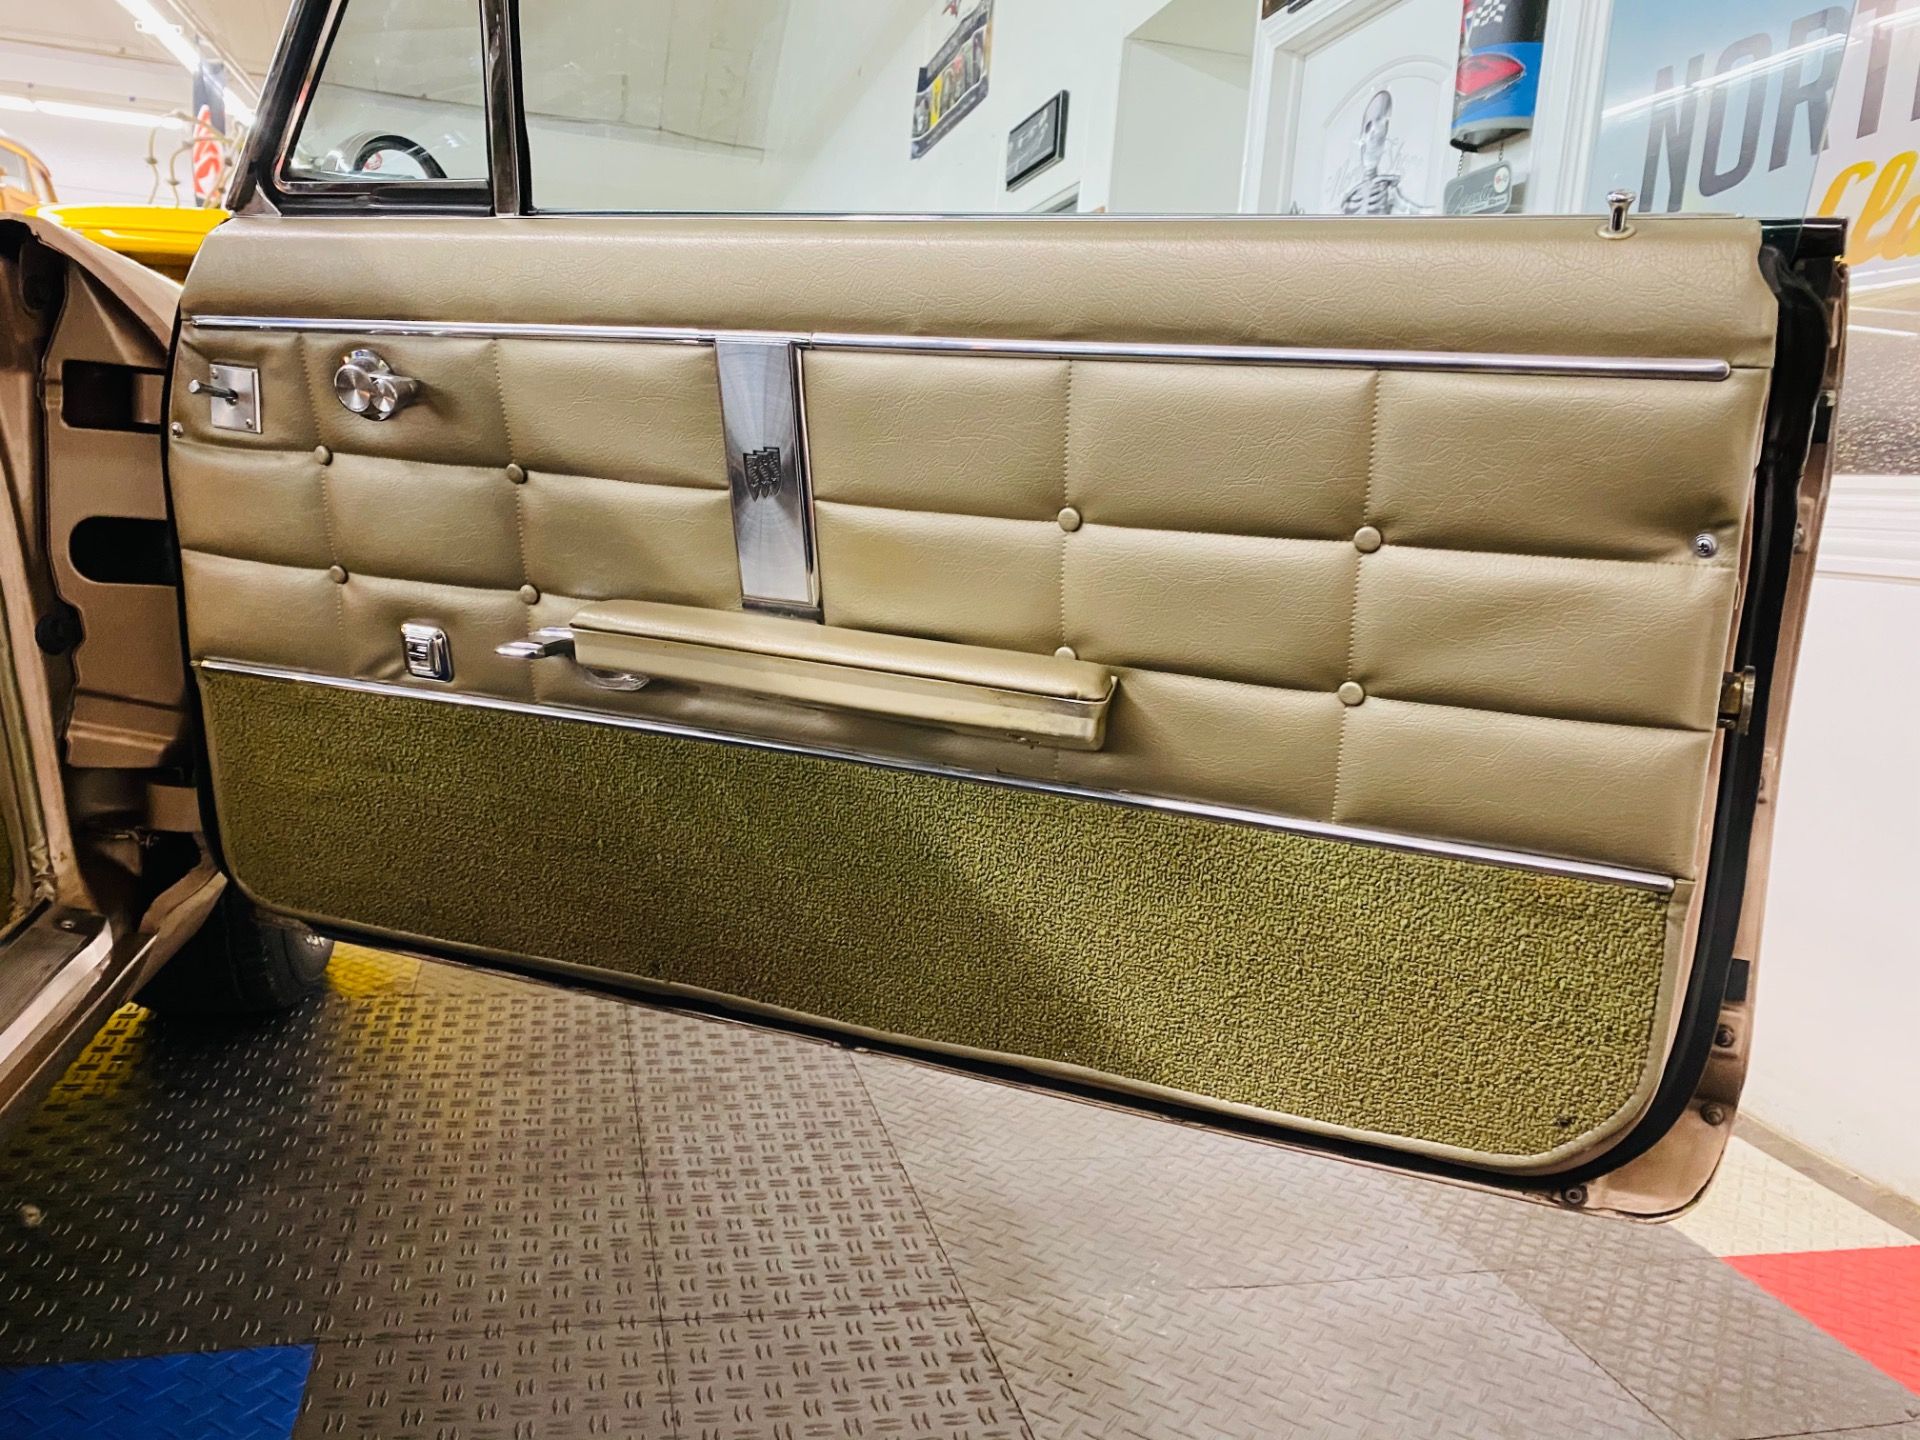 Used 1964 Buick Riviera - 425 WILDCAT ENGINE - HIGH QUALITY RESTORATION - SEE VIDEO | Mundelein, IL